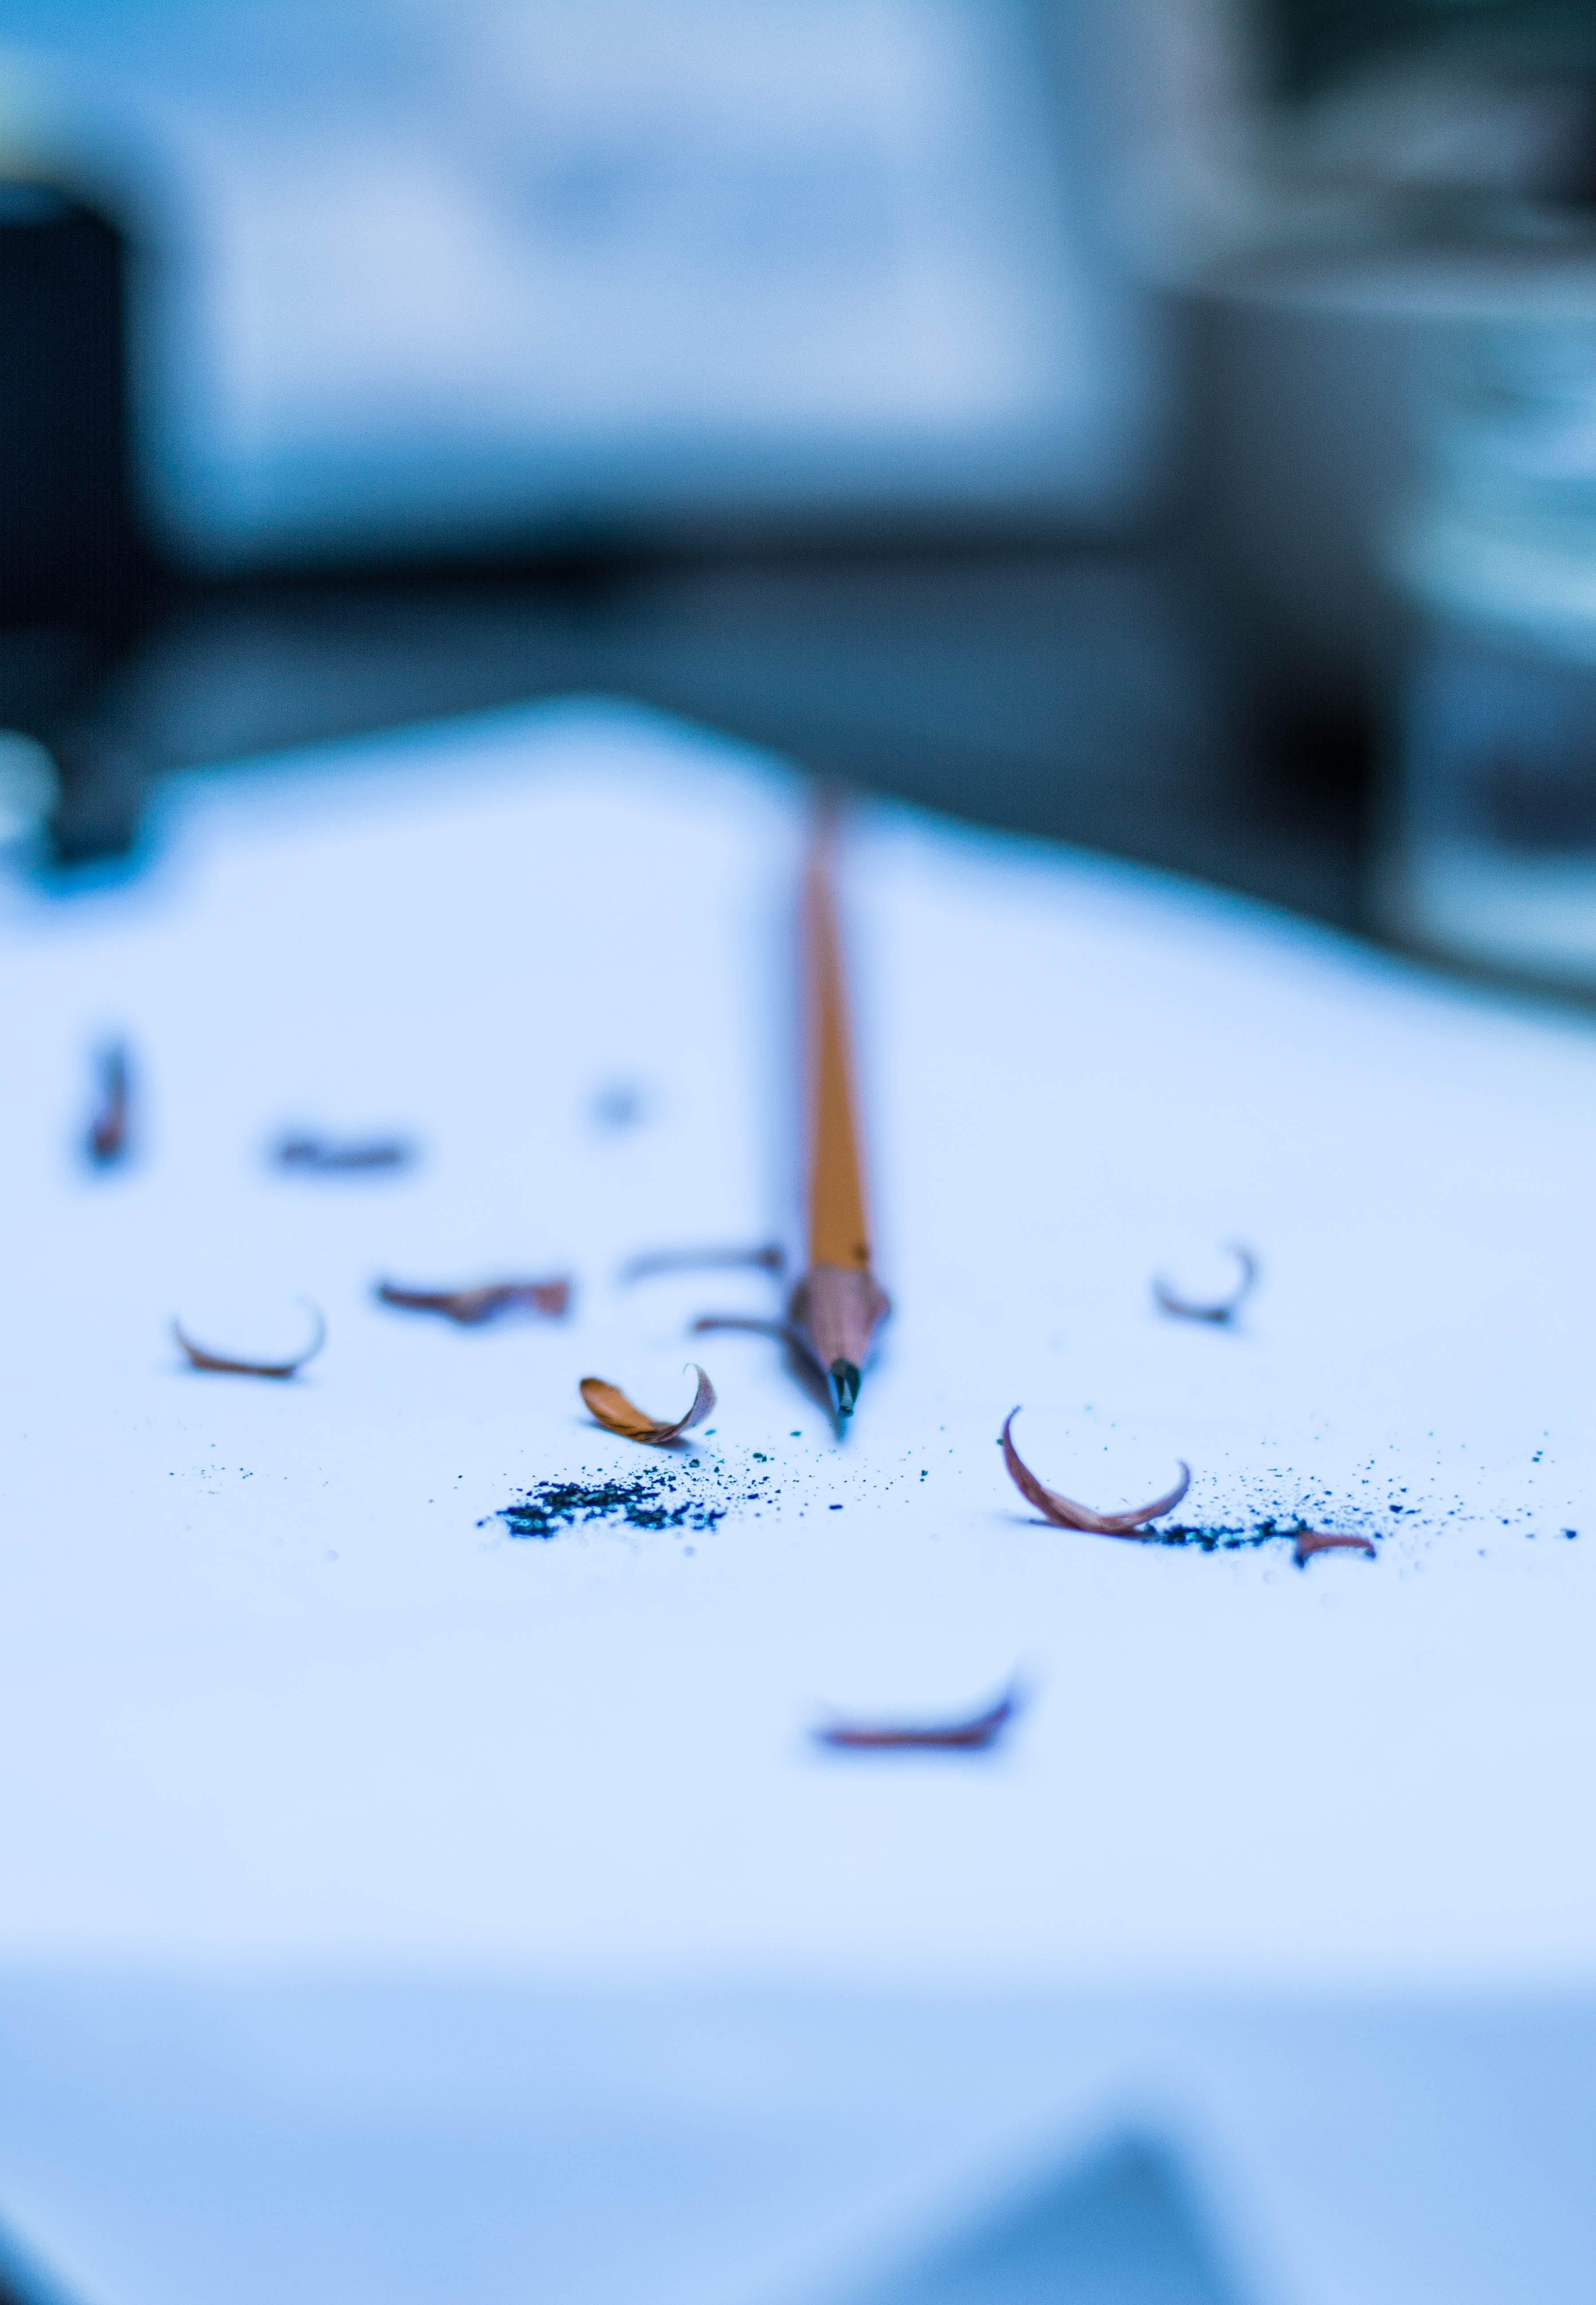 Free stock photo of #pencil #art #graphic #artsupplies